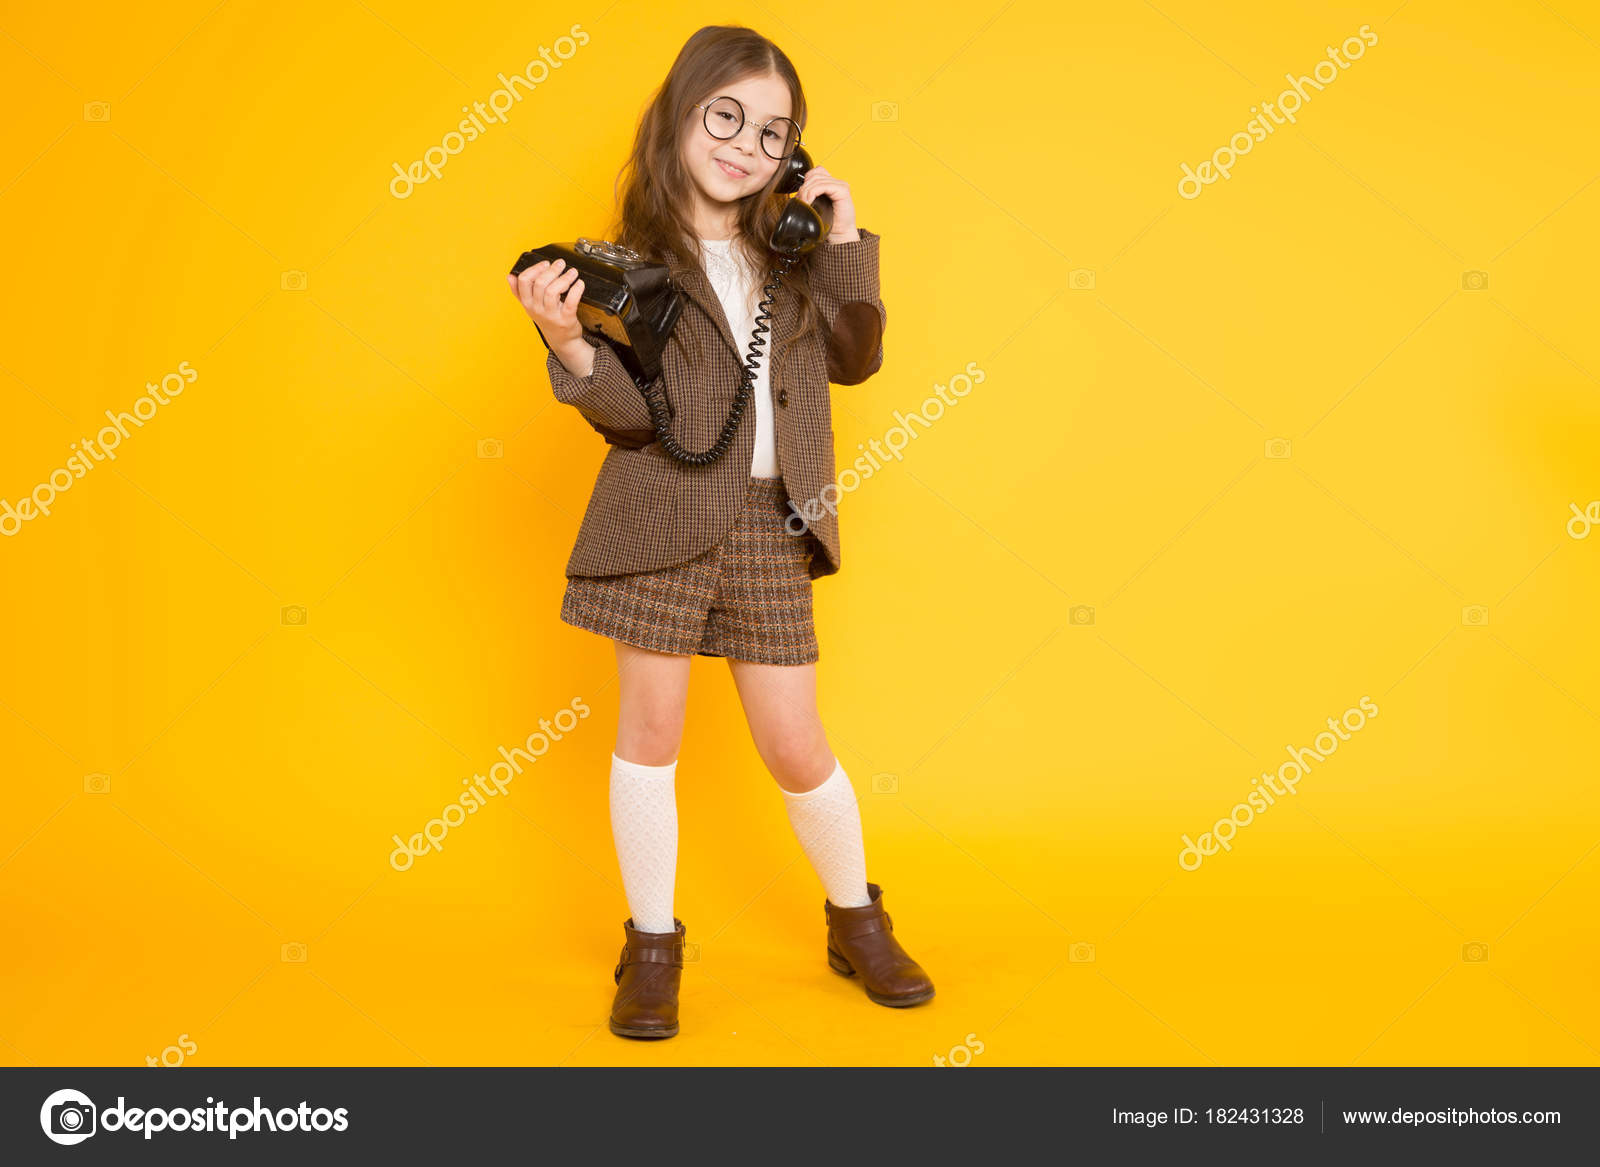 f8de0f3fd2b Χαριτωμένο Μικρό Κορίτσι Μελαχρινή Μιλάμε Για Παλιό Τηλέφωνο Κίτρινο Φόντο  — Φωτογραφία Αρχείου